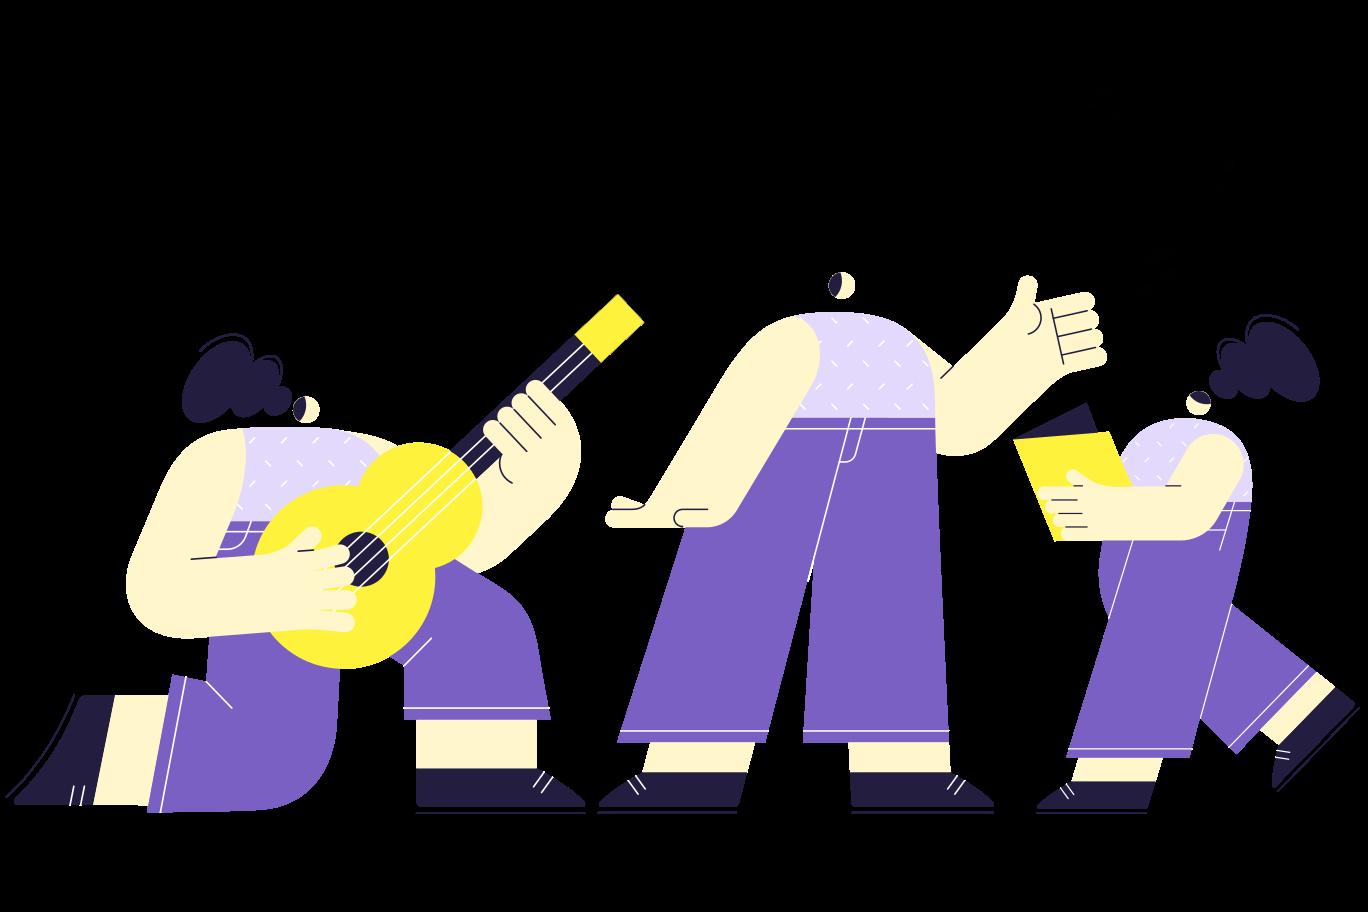 Family concert Clipart illustration in PNG, SVG